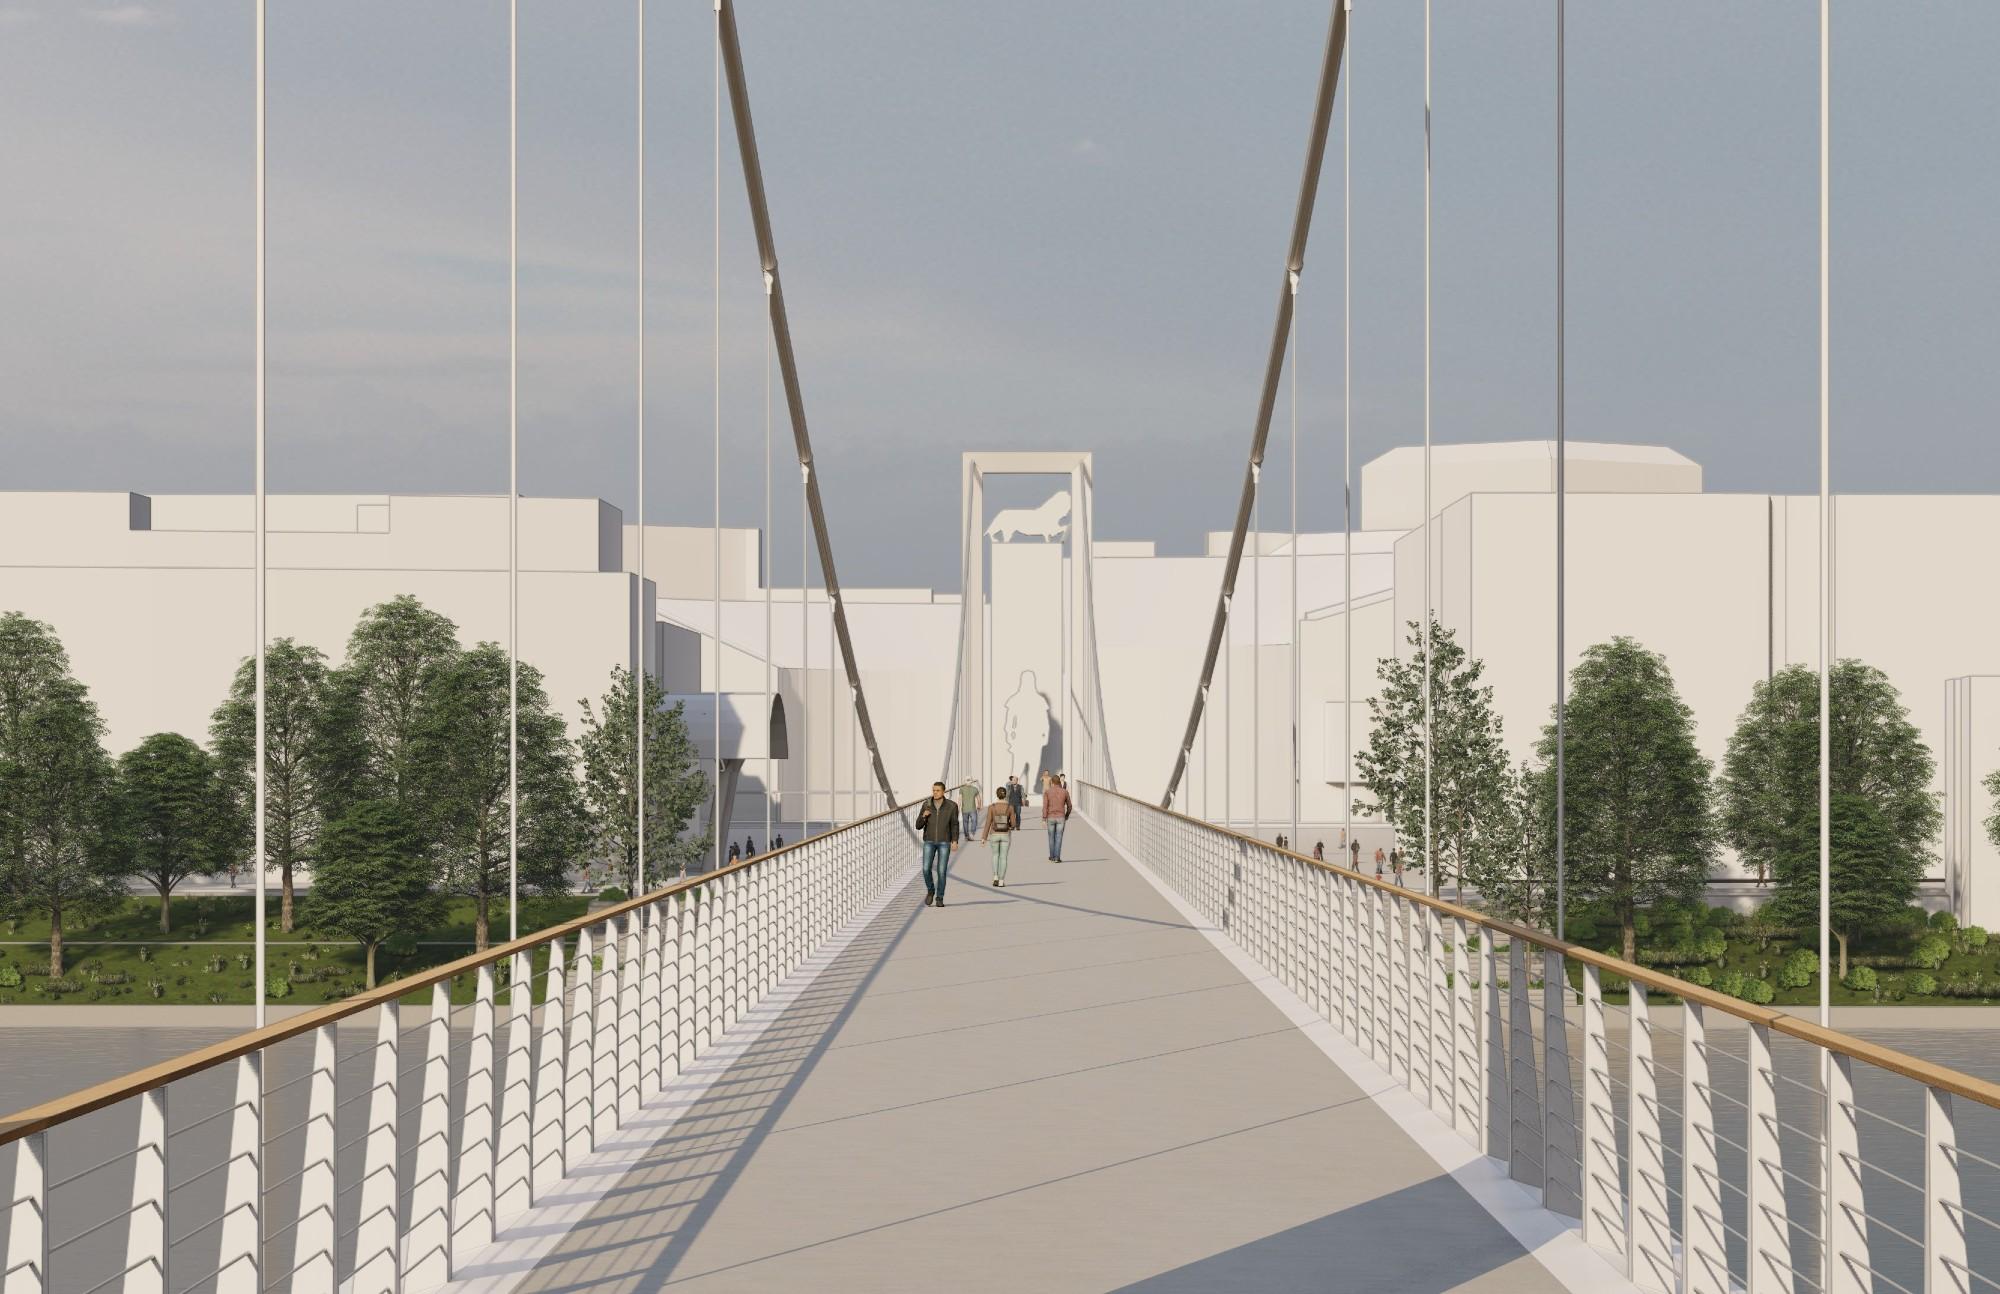 Oceneny promenadny most c 7 vizualizacia 2